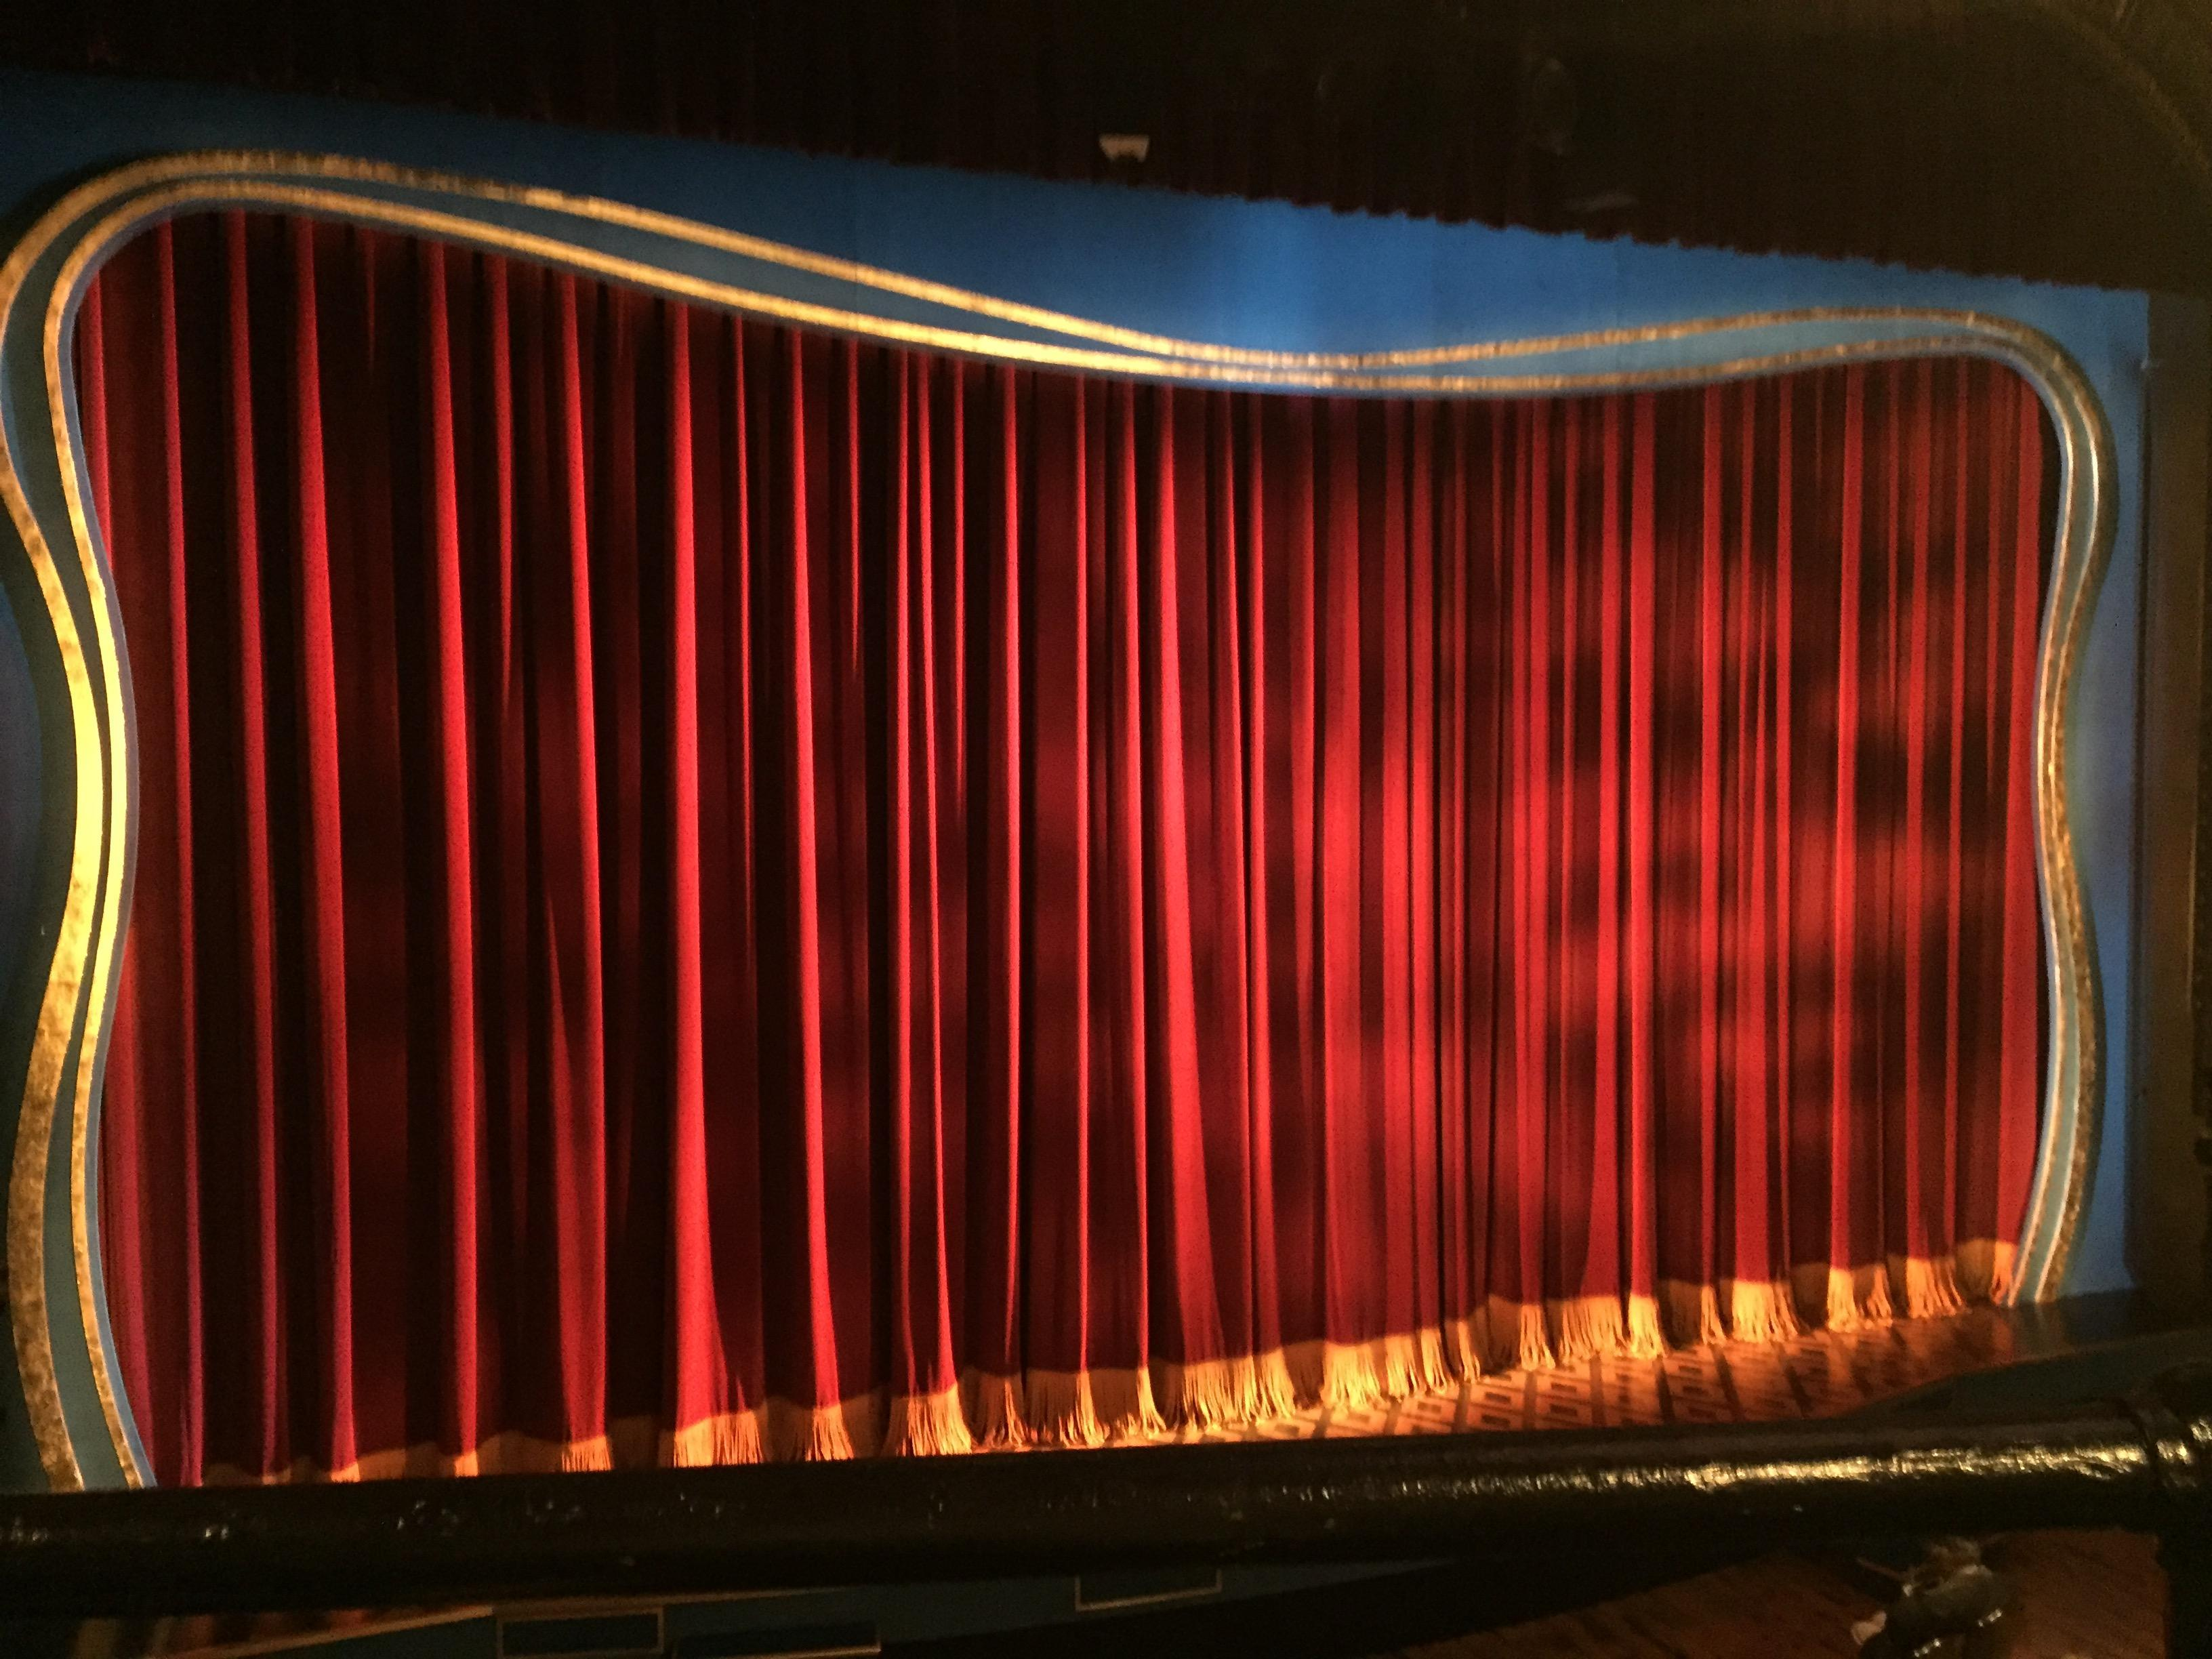 Studio 54 Section FMEZZ Row AA Seat 121